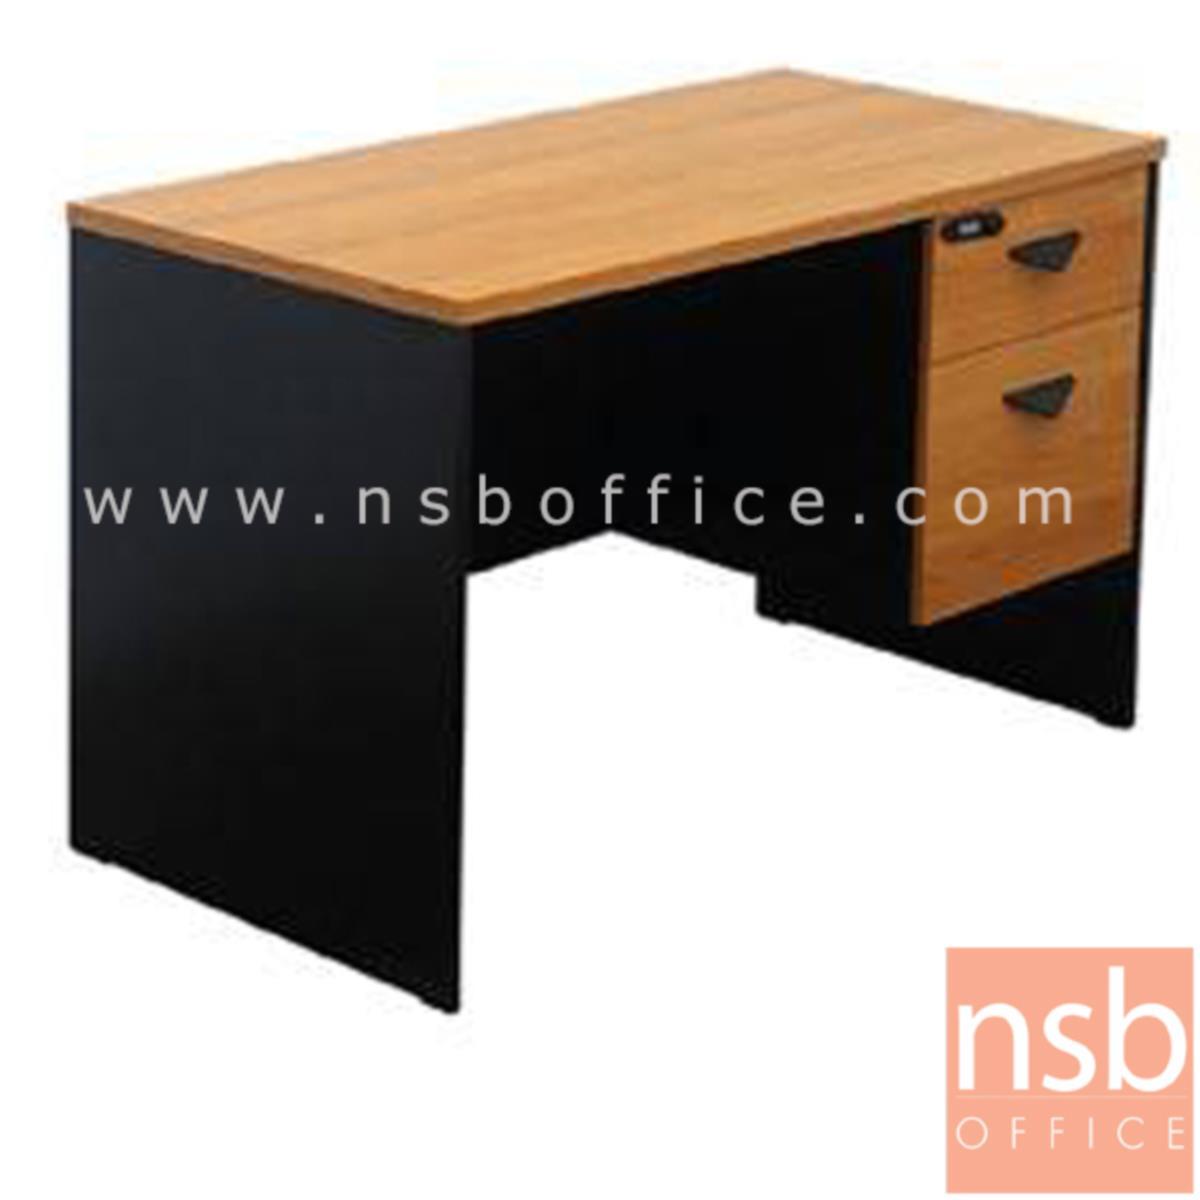 A12A076:โต๊ะทำงาน 2 ลิ้นชัก  รุ่น Guy (กาย) ขนาด 120W cm.